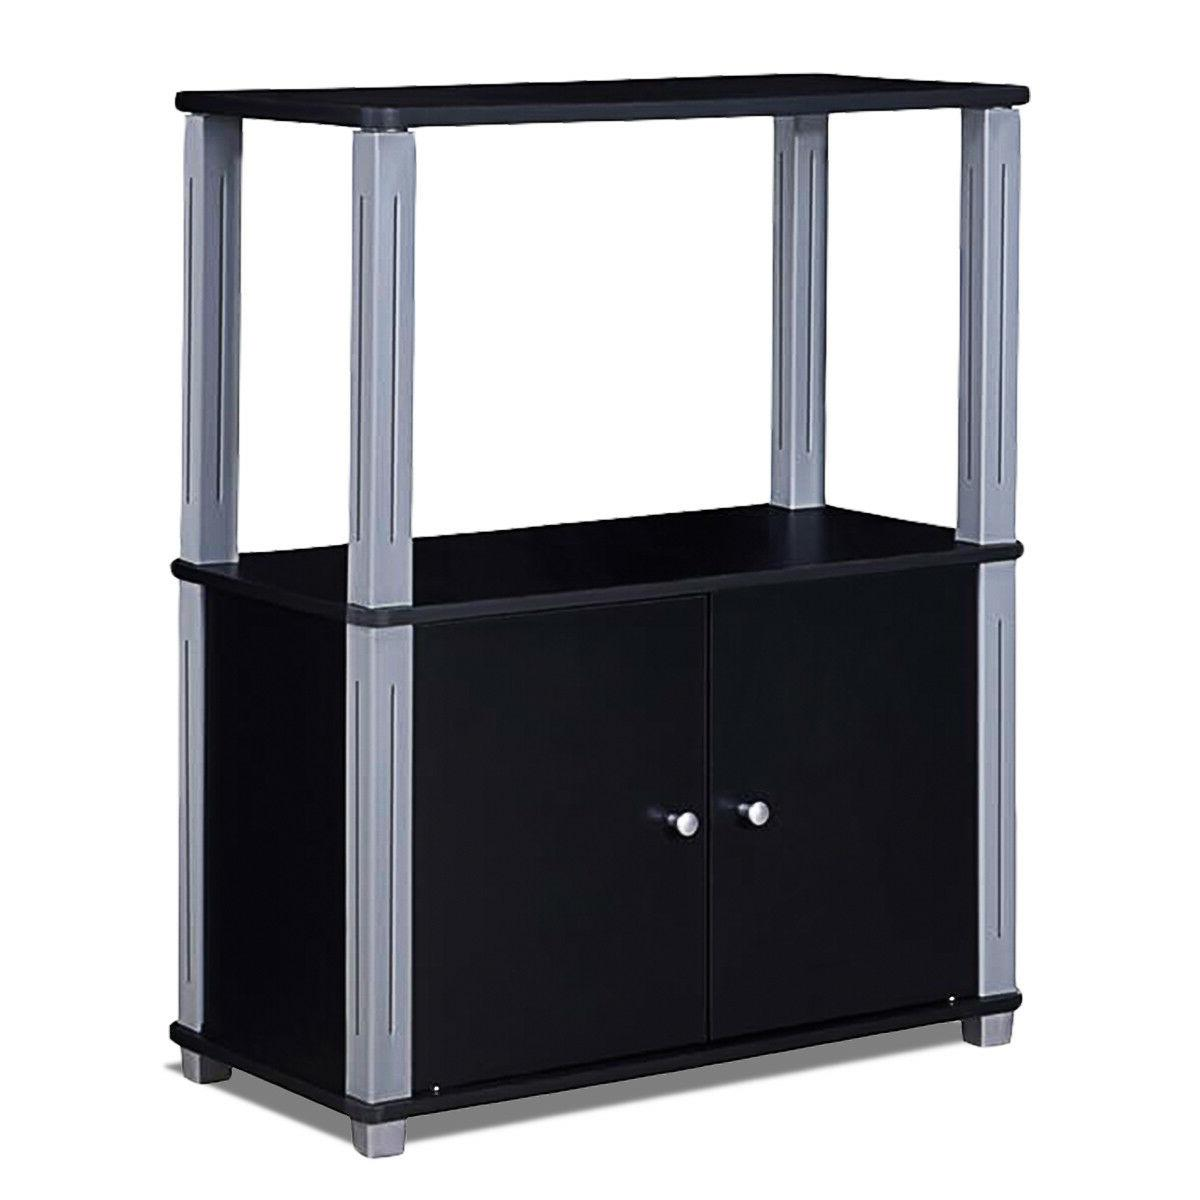 TV Stand Multipurpose Display w/ Storage